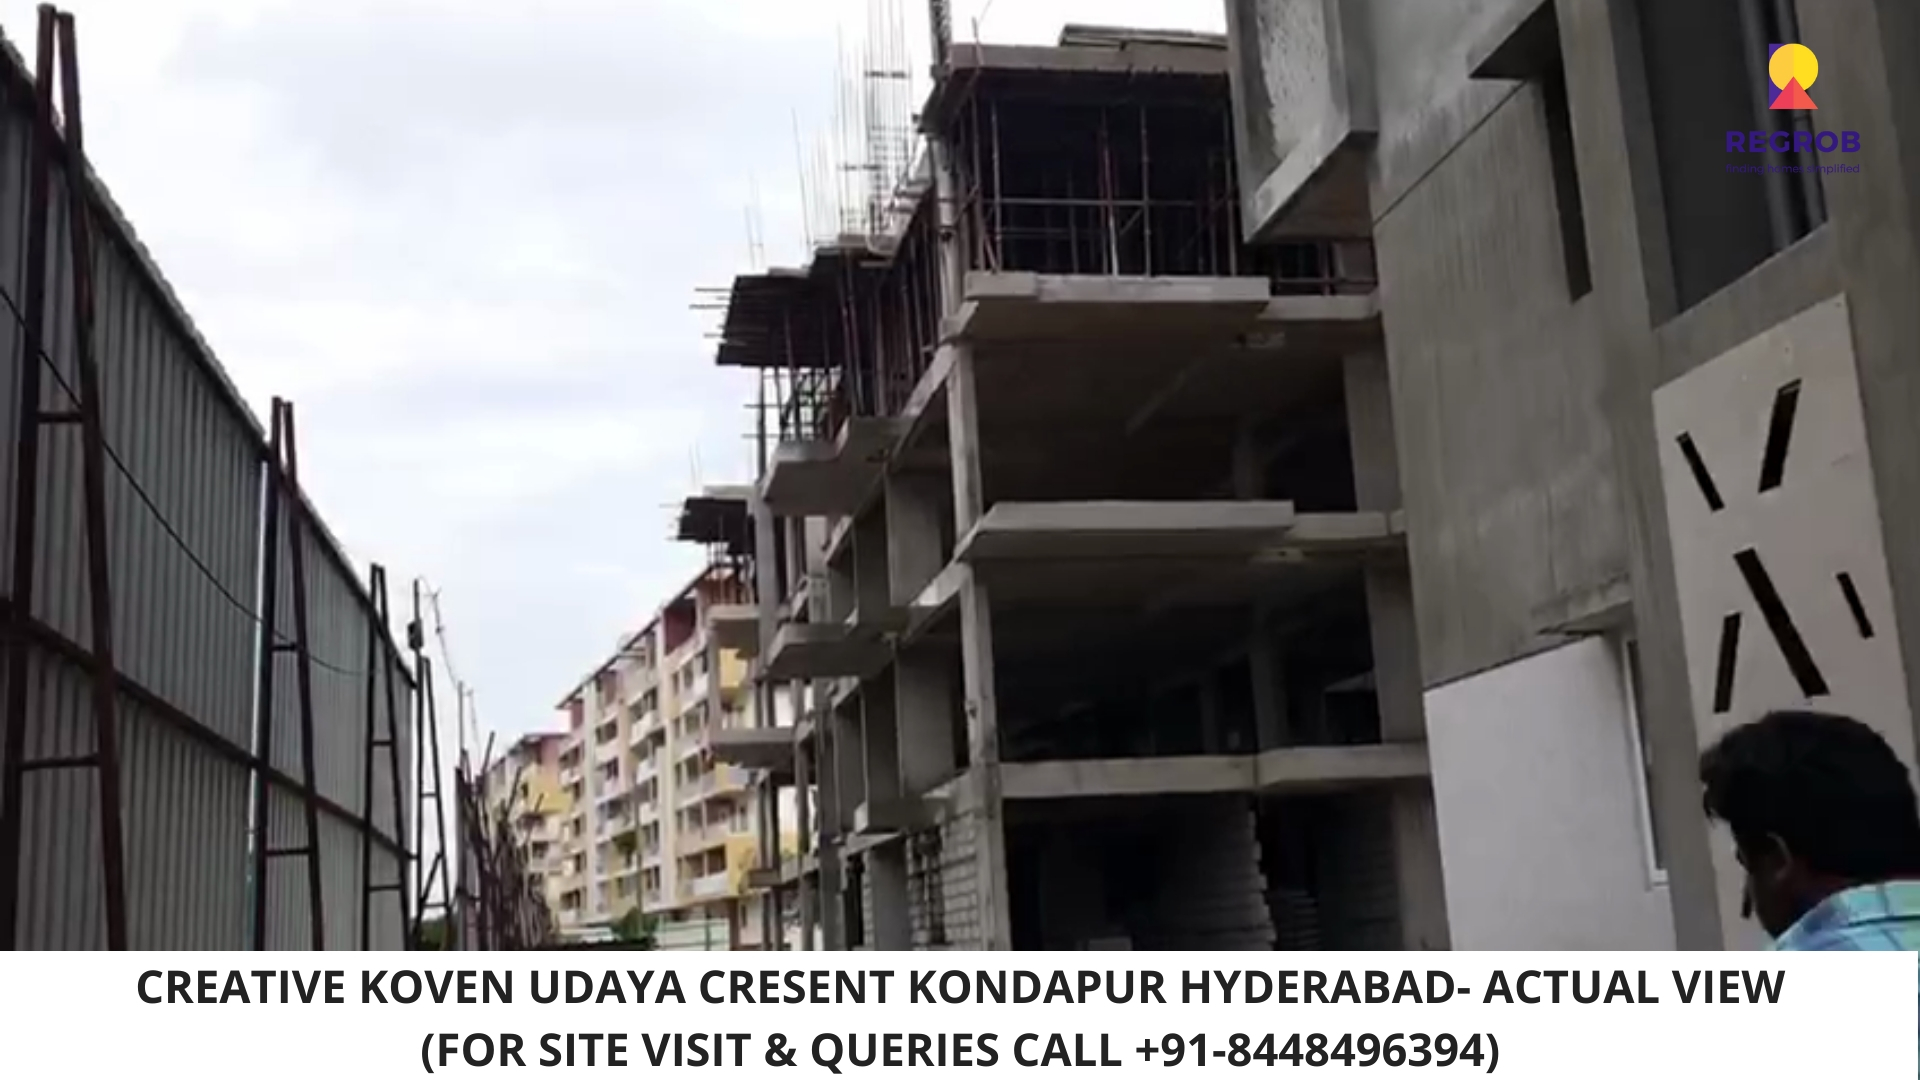 Creative Koven Udaya Cresent Kondapur Hyderabad